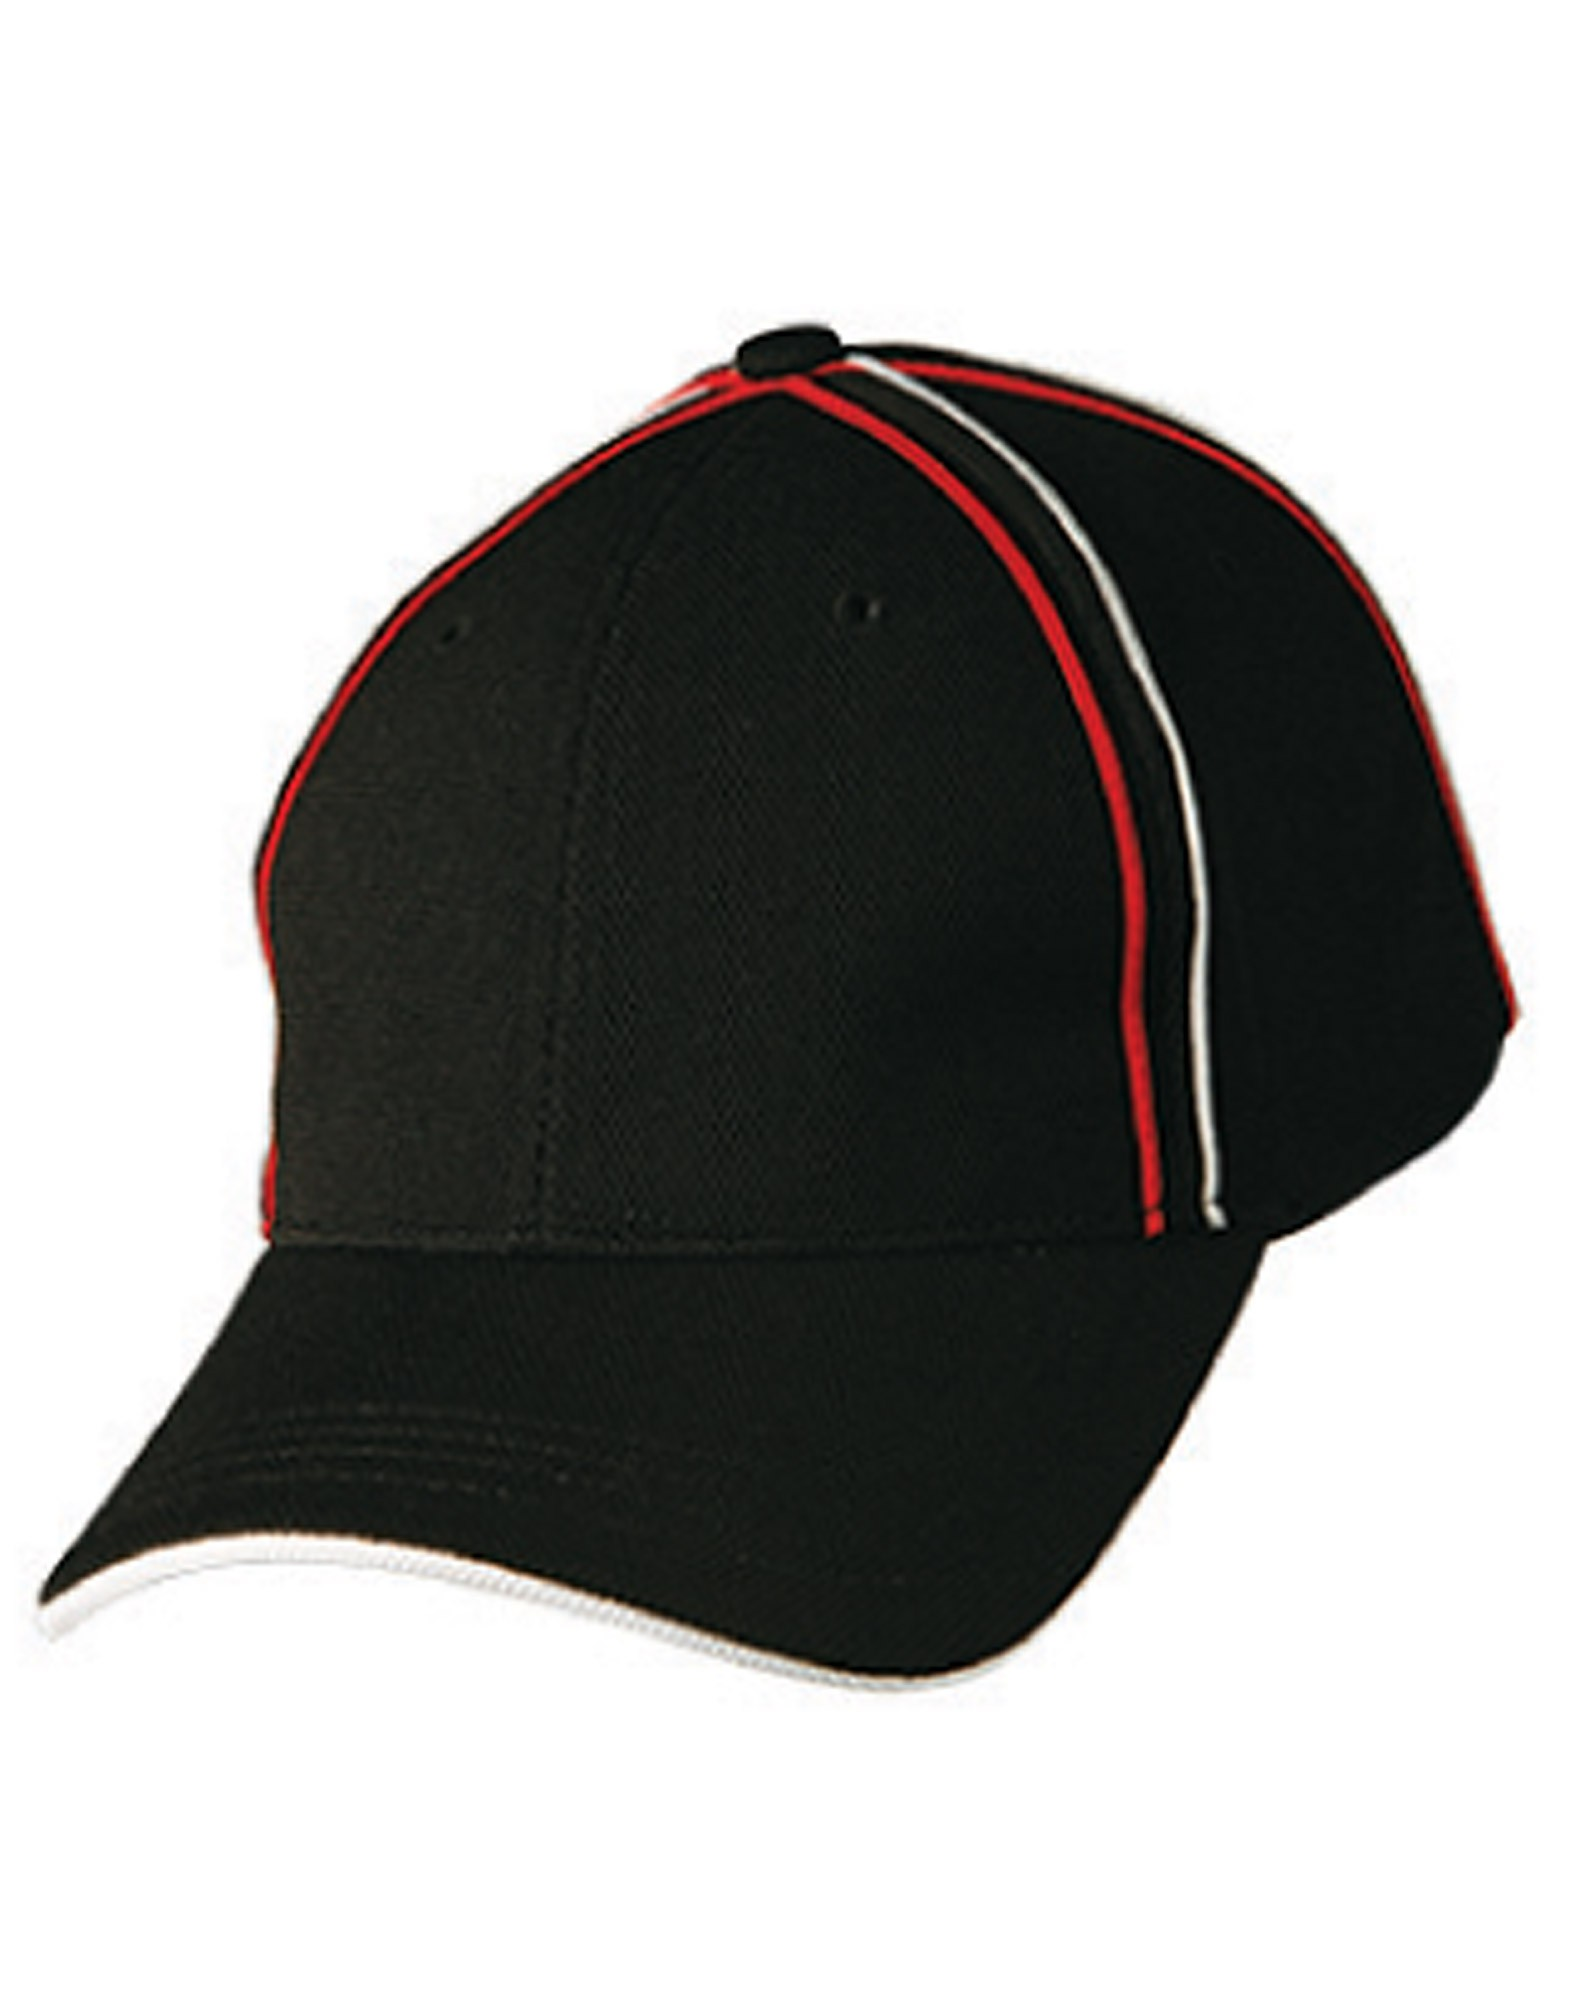 Tri_Colour Pique Mesh Cap